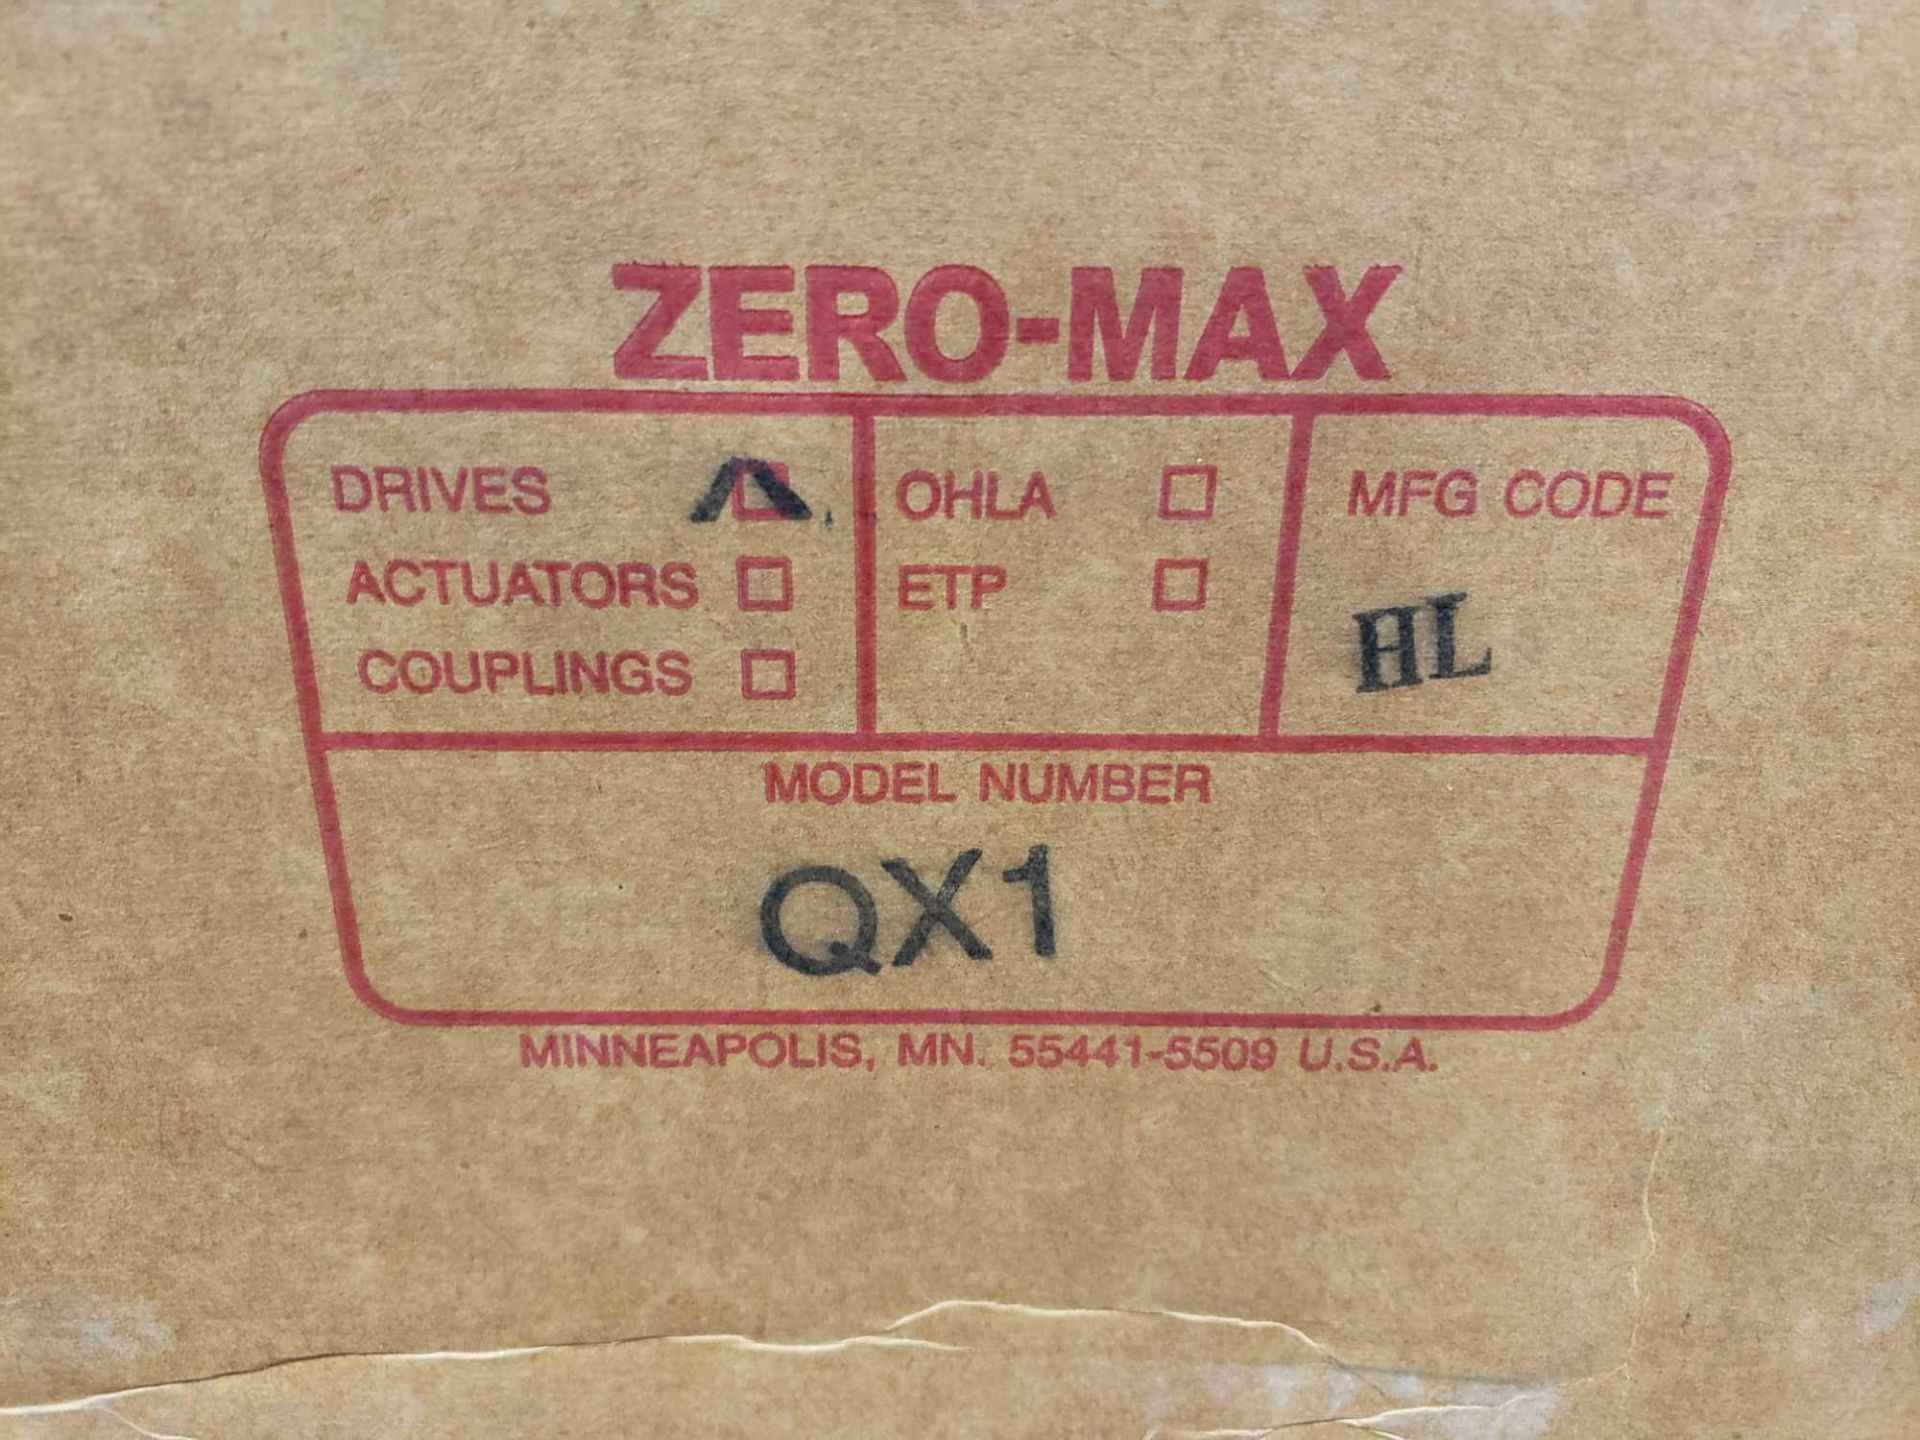 Lot 40 - Zero-max drive power block model QX1 CCW output rotation, 100lb torque, 0-400 speed range. New.